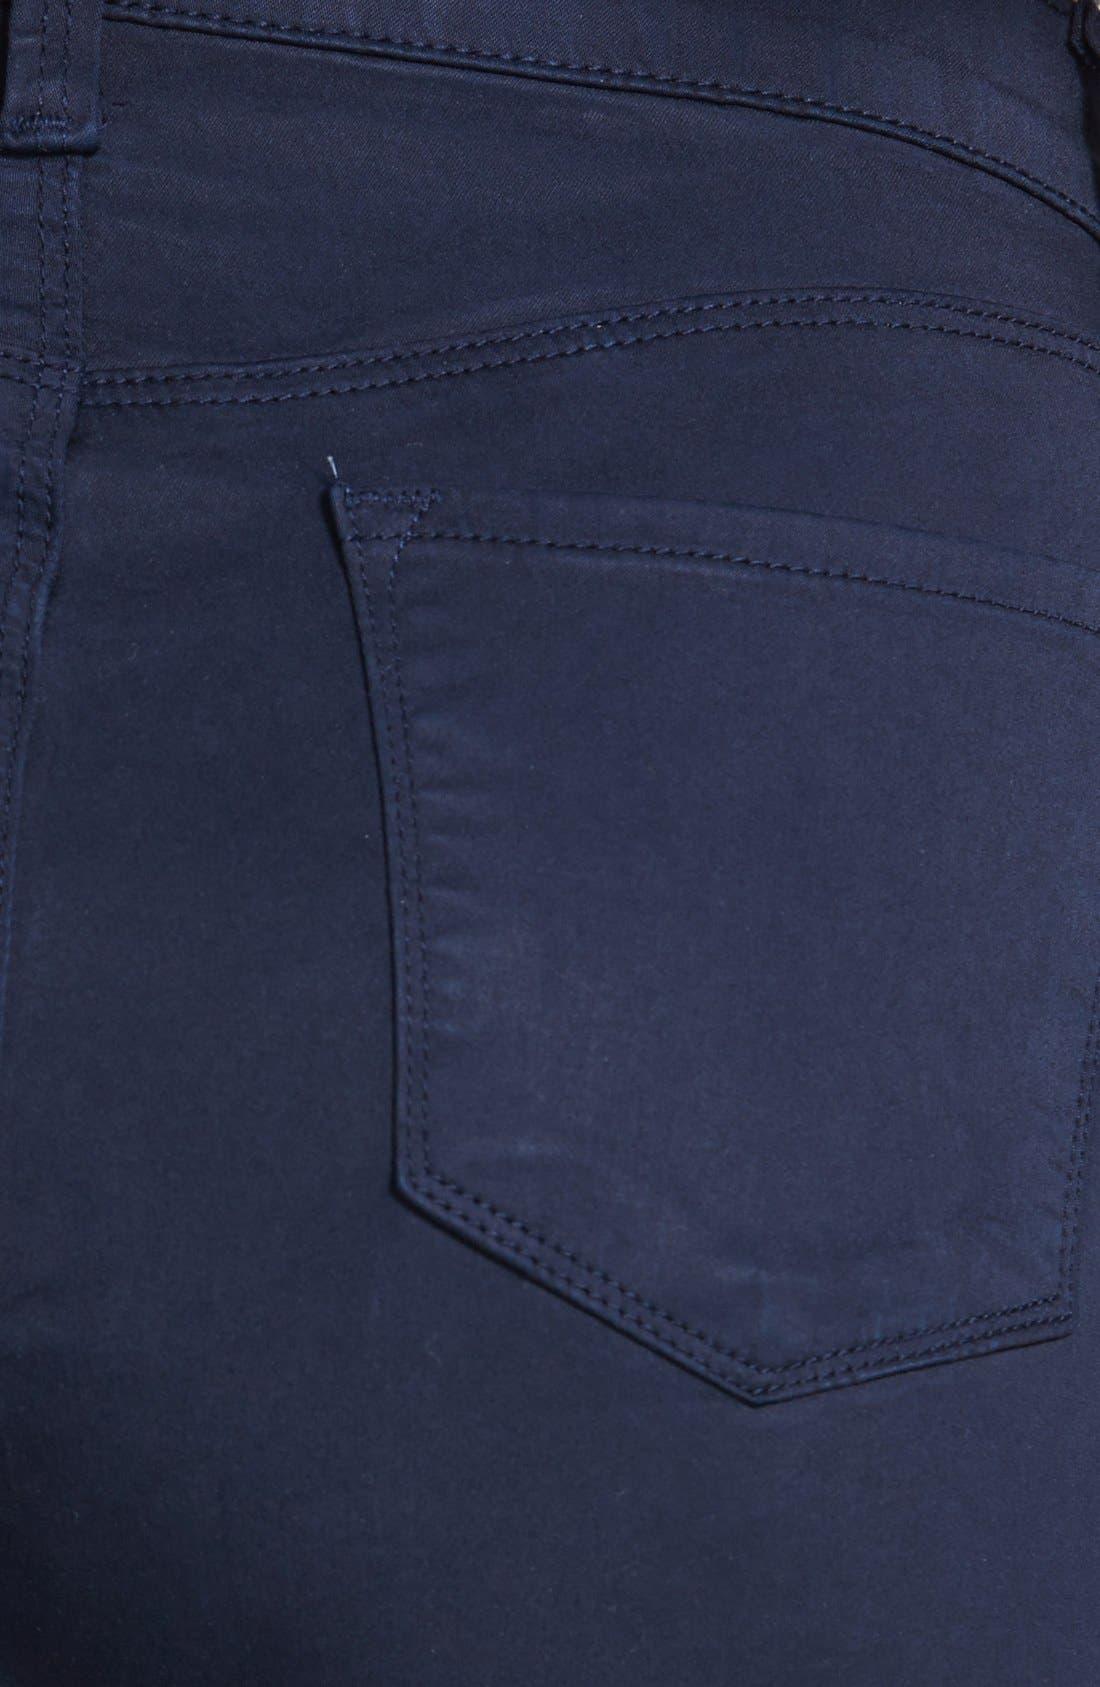 Alternate Image 3  - J Brand 'Maria 2311' High Rise Skinny Jeans (Marine)